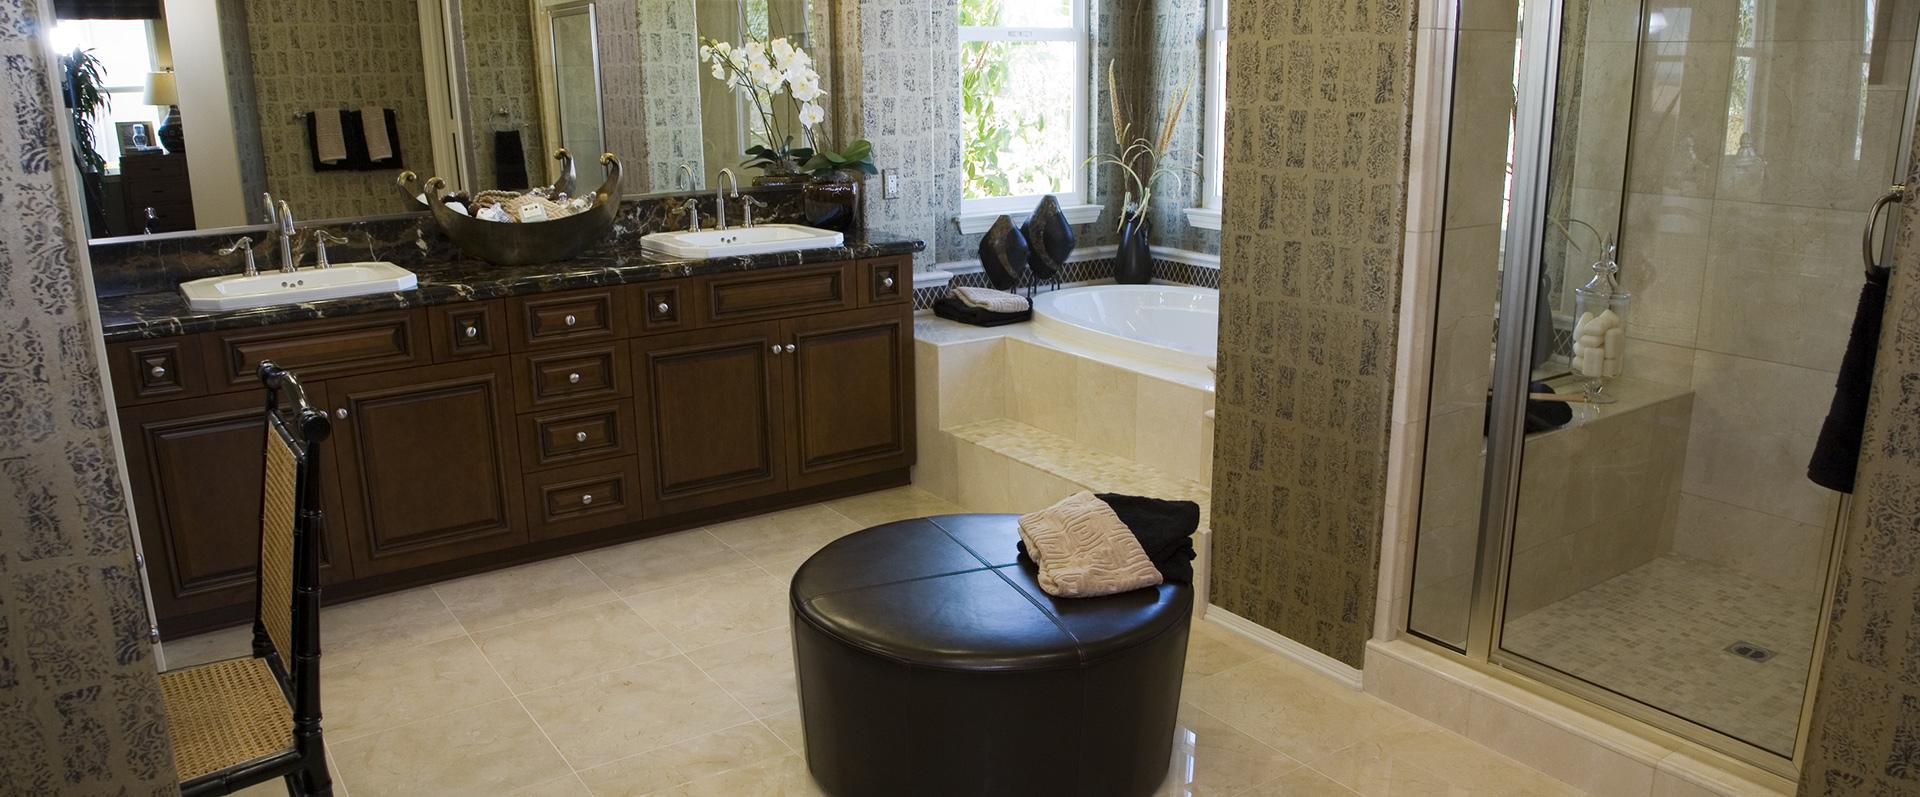 Bathroom Remodeling Walnut Creek Ca 28 Images Expert Kitchen And Bathroom Remodelers In